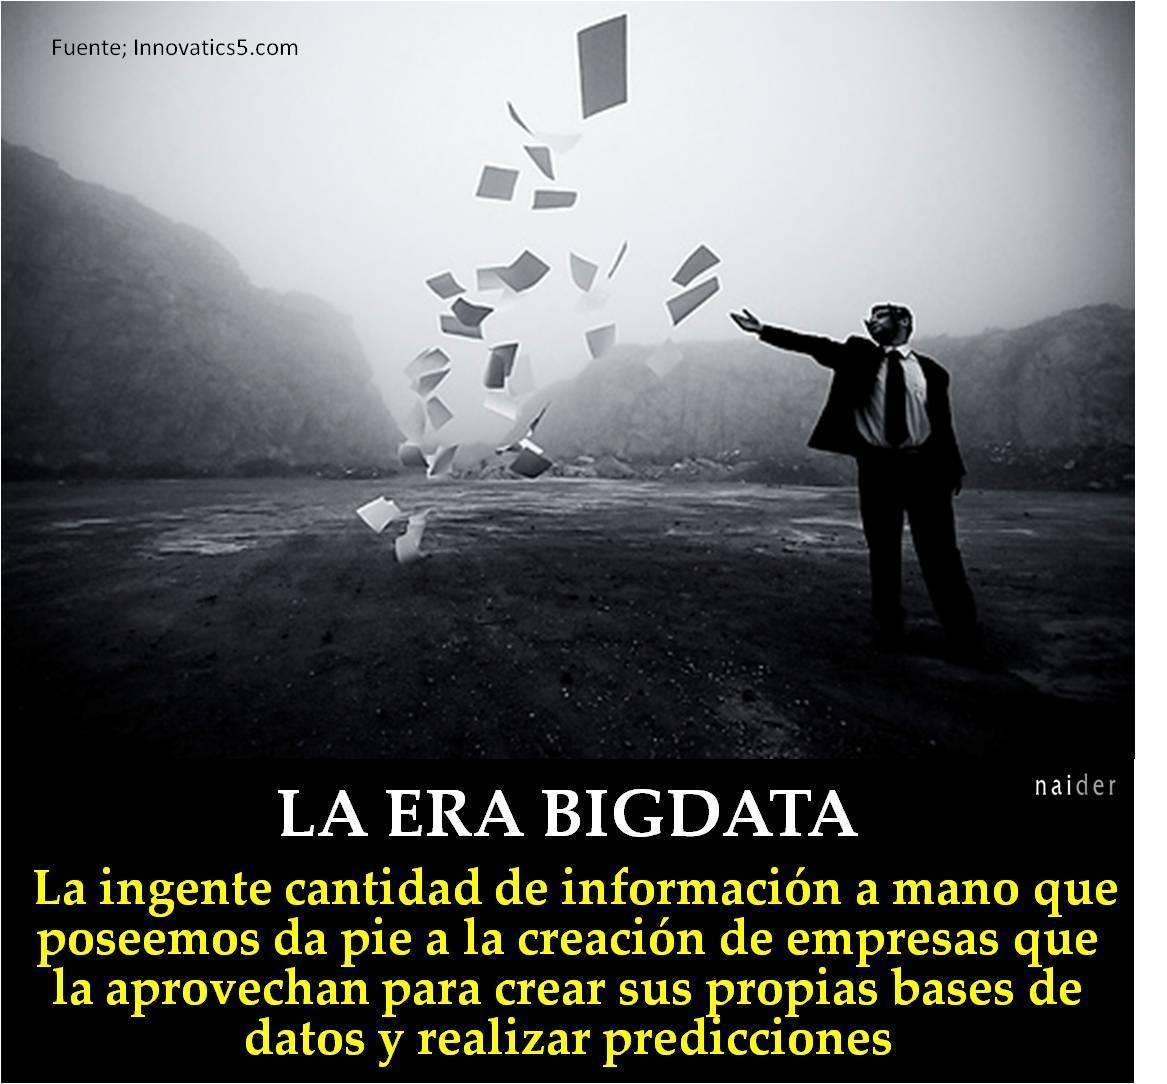 La era BigData